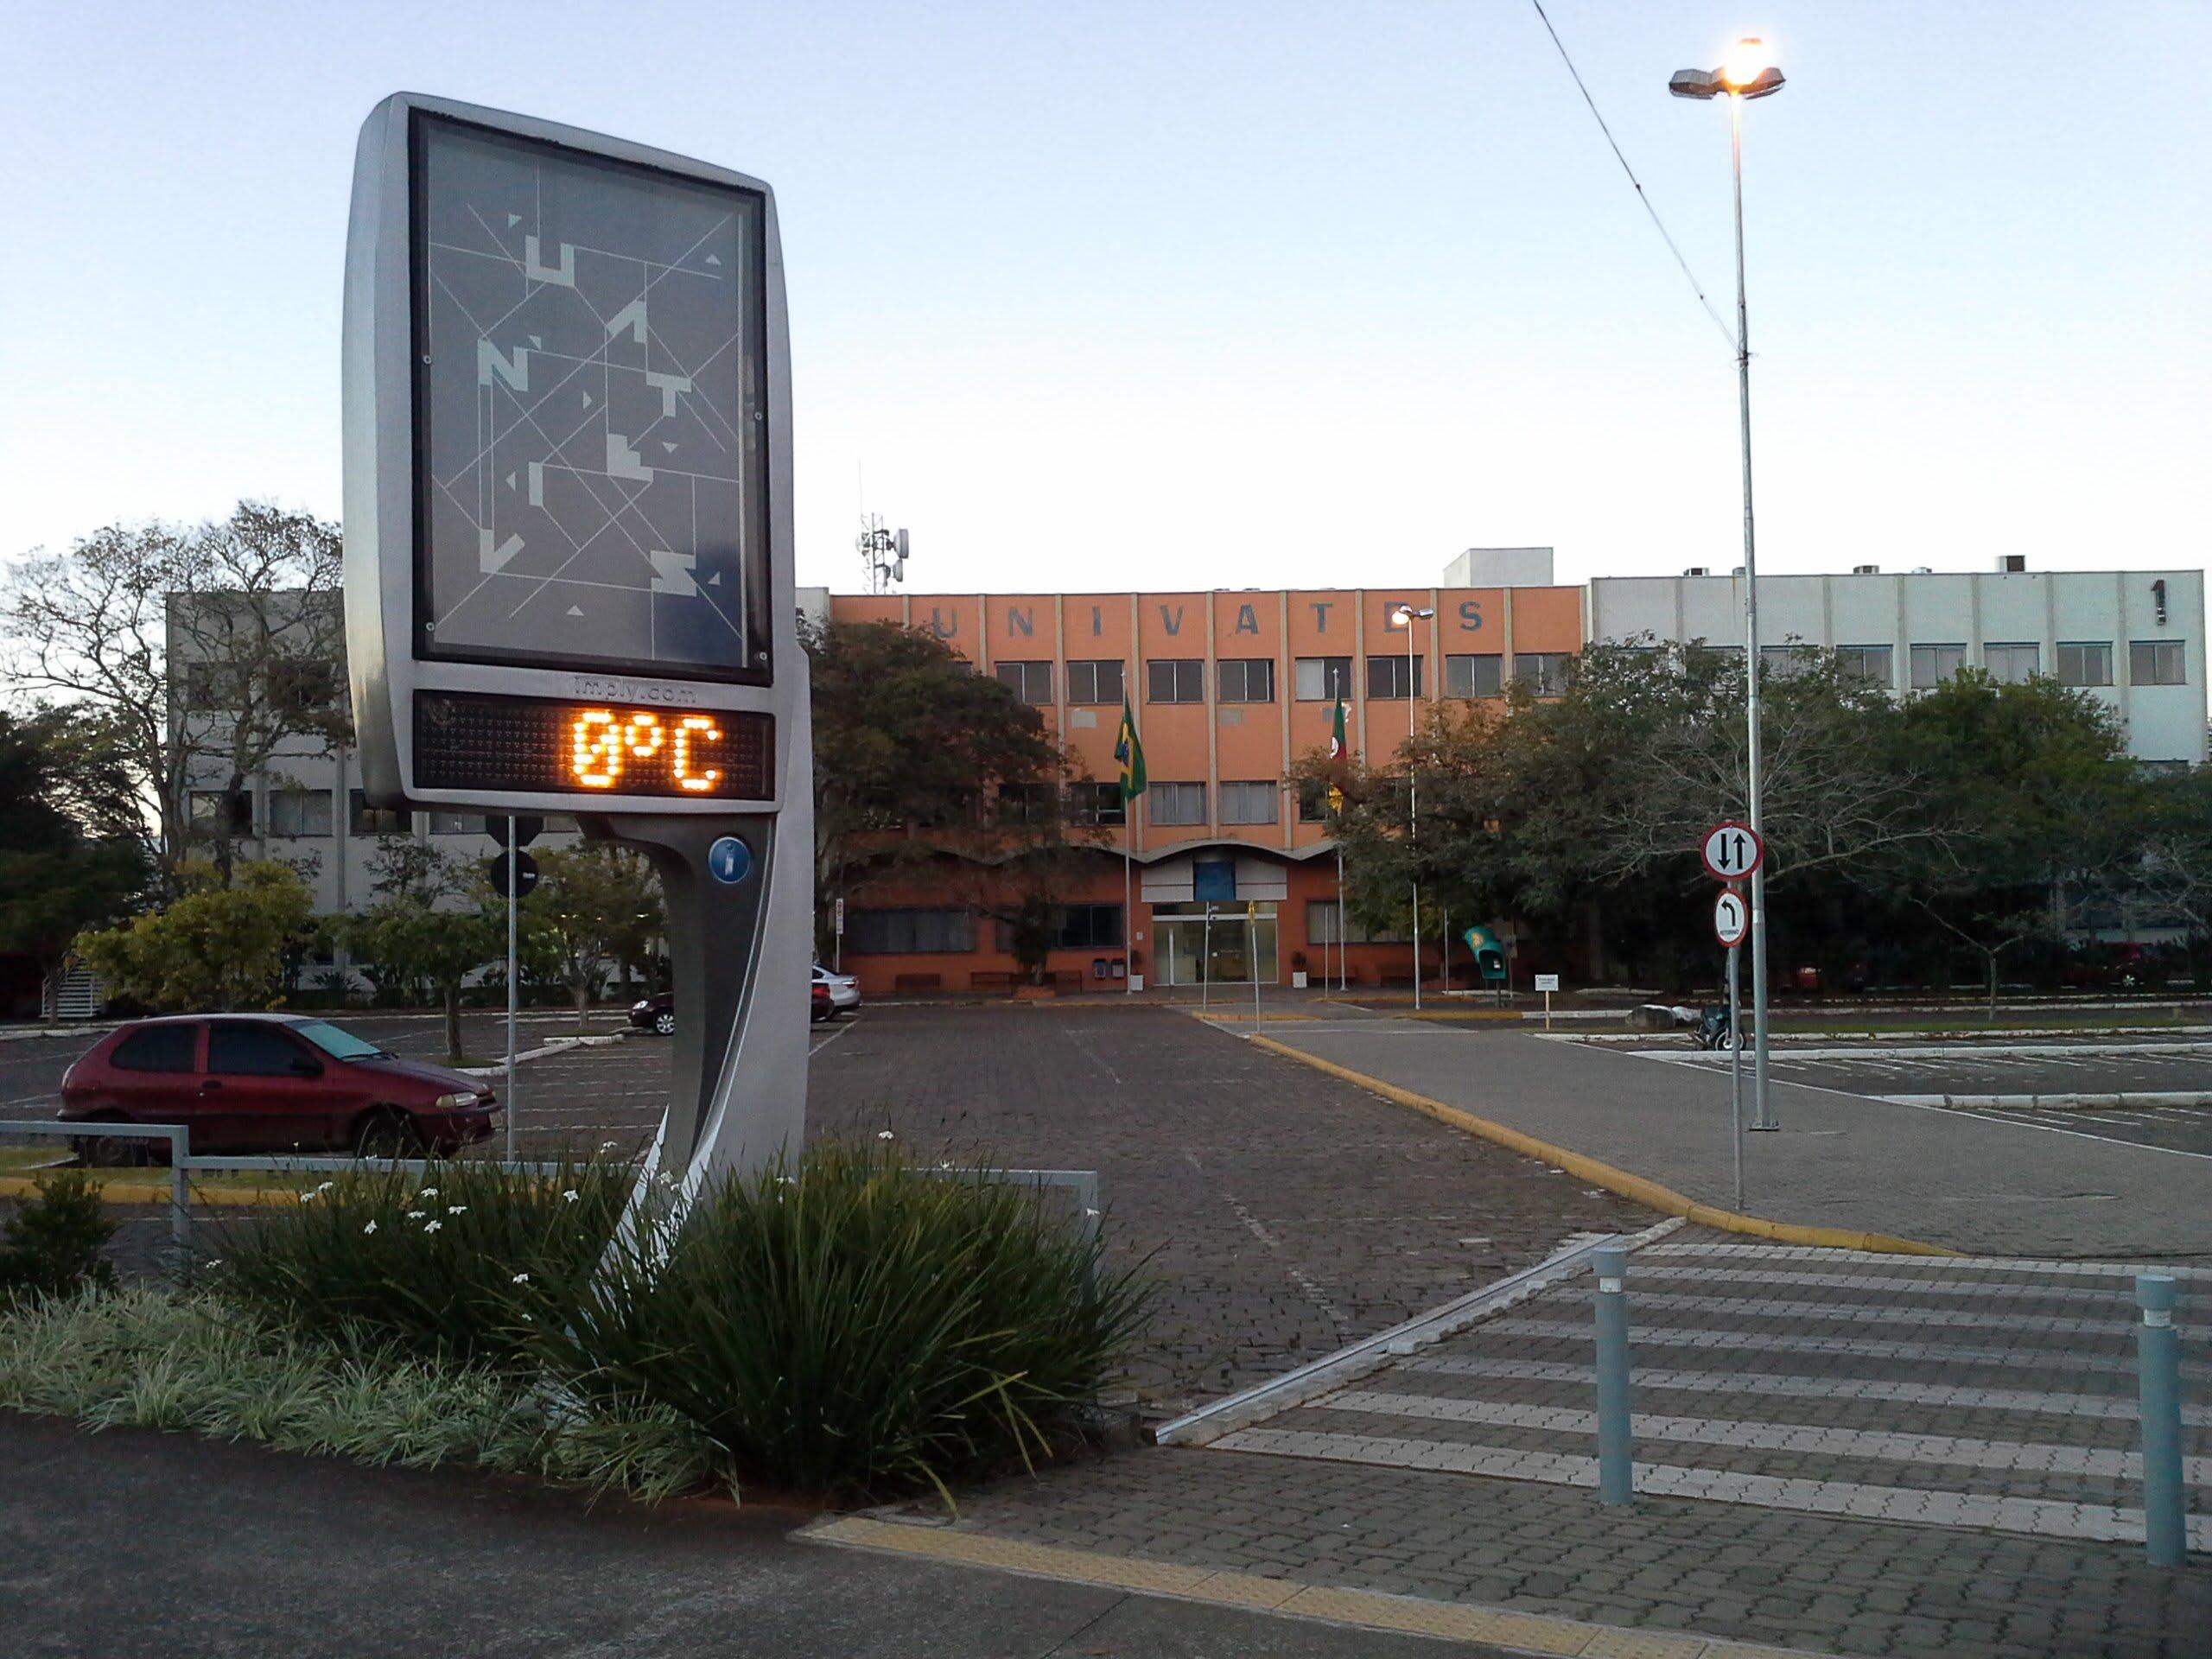 Termômetro de rua apontando 0°C